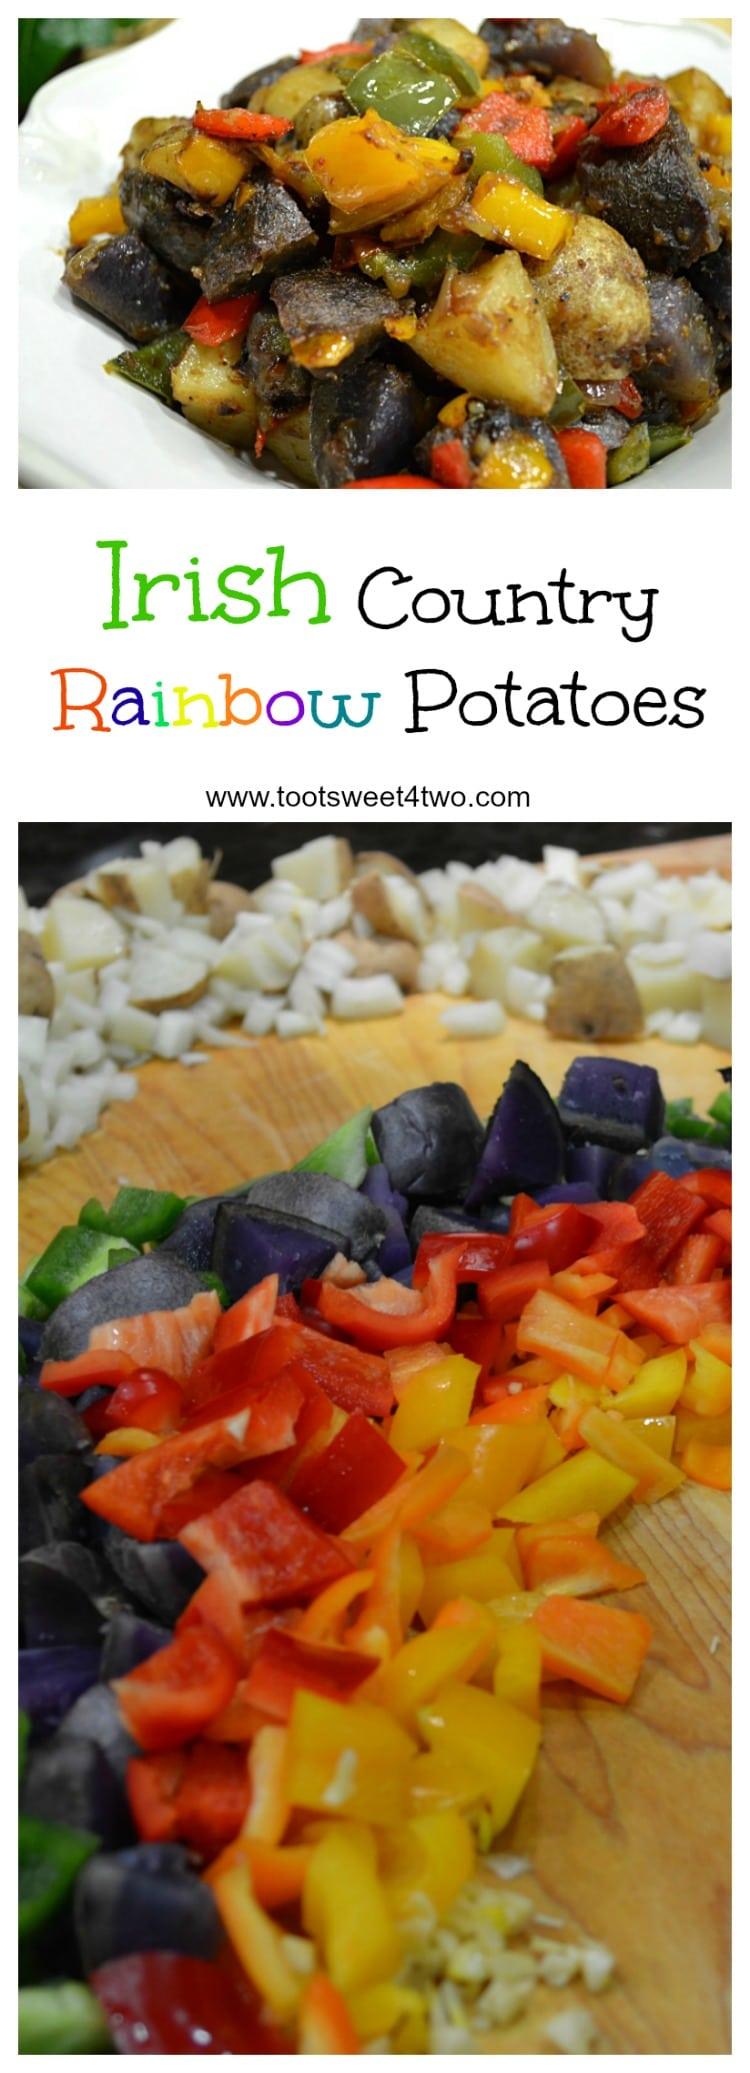 Irish Country Rainbow Potatoes collage